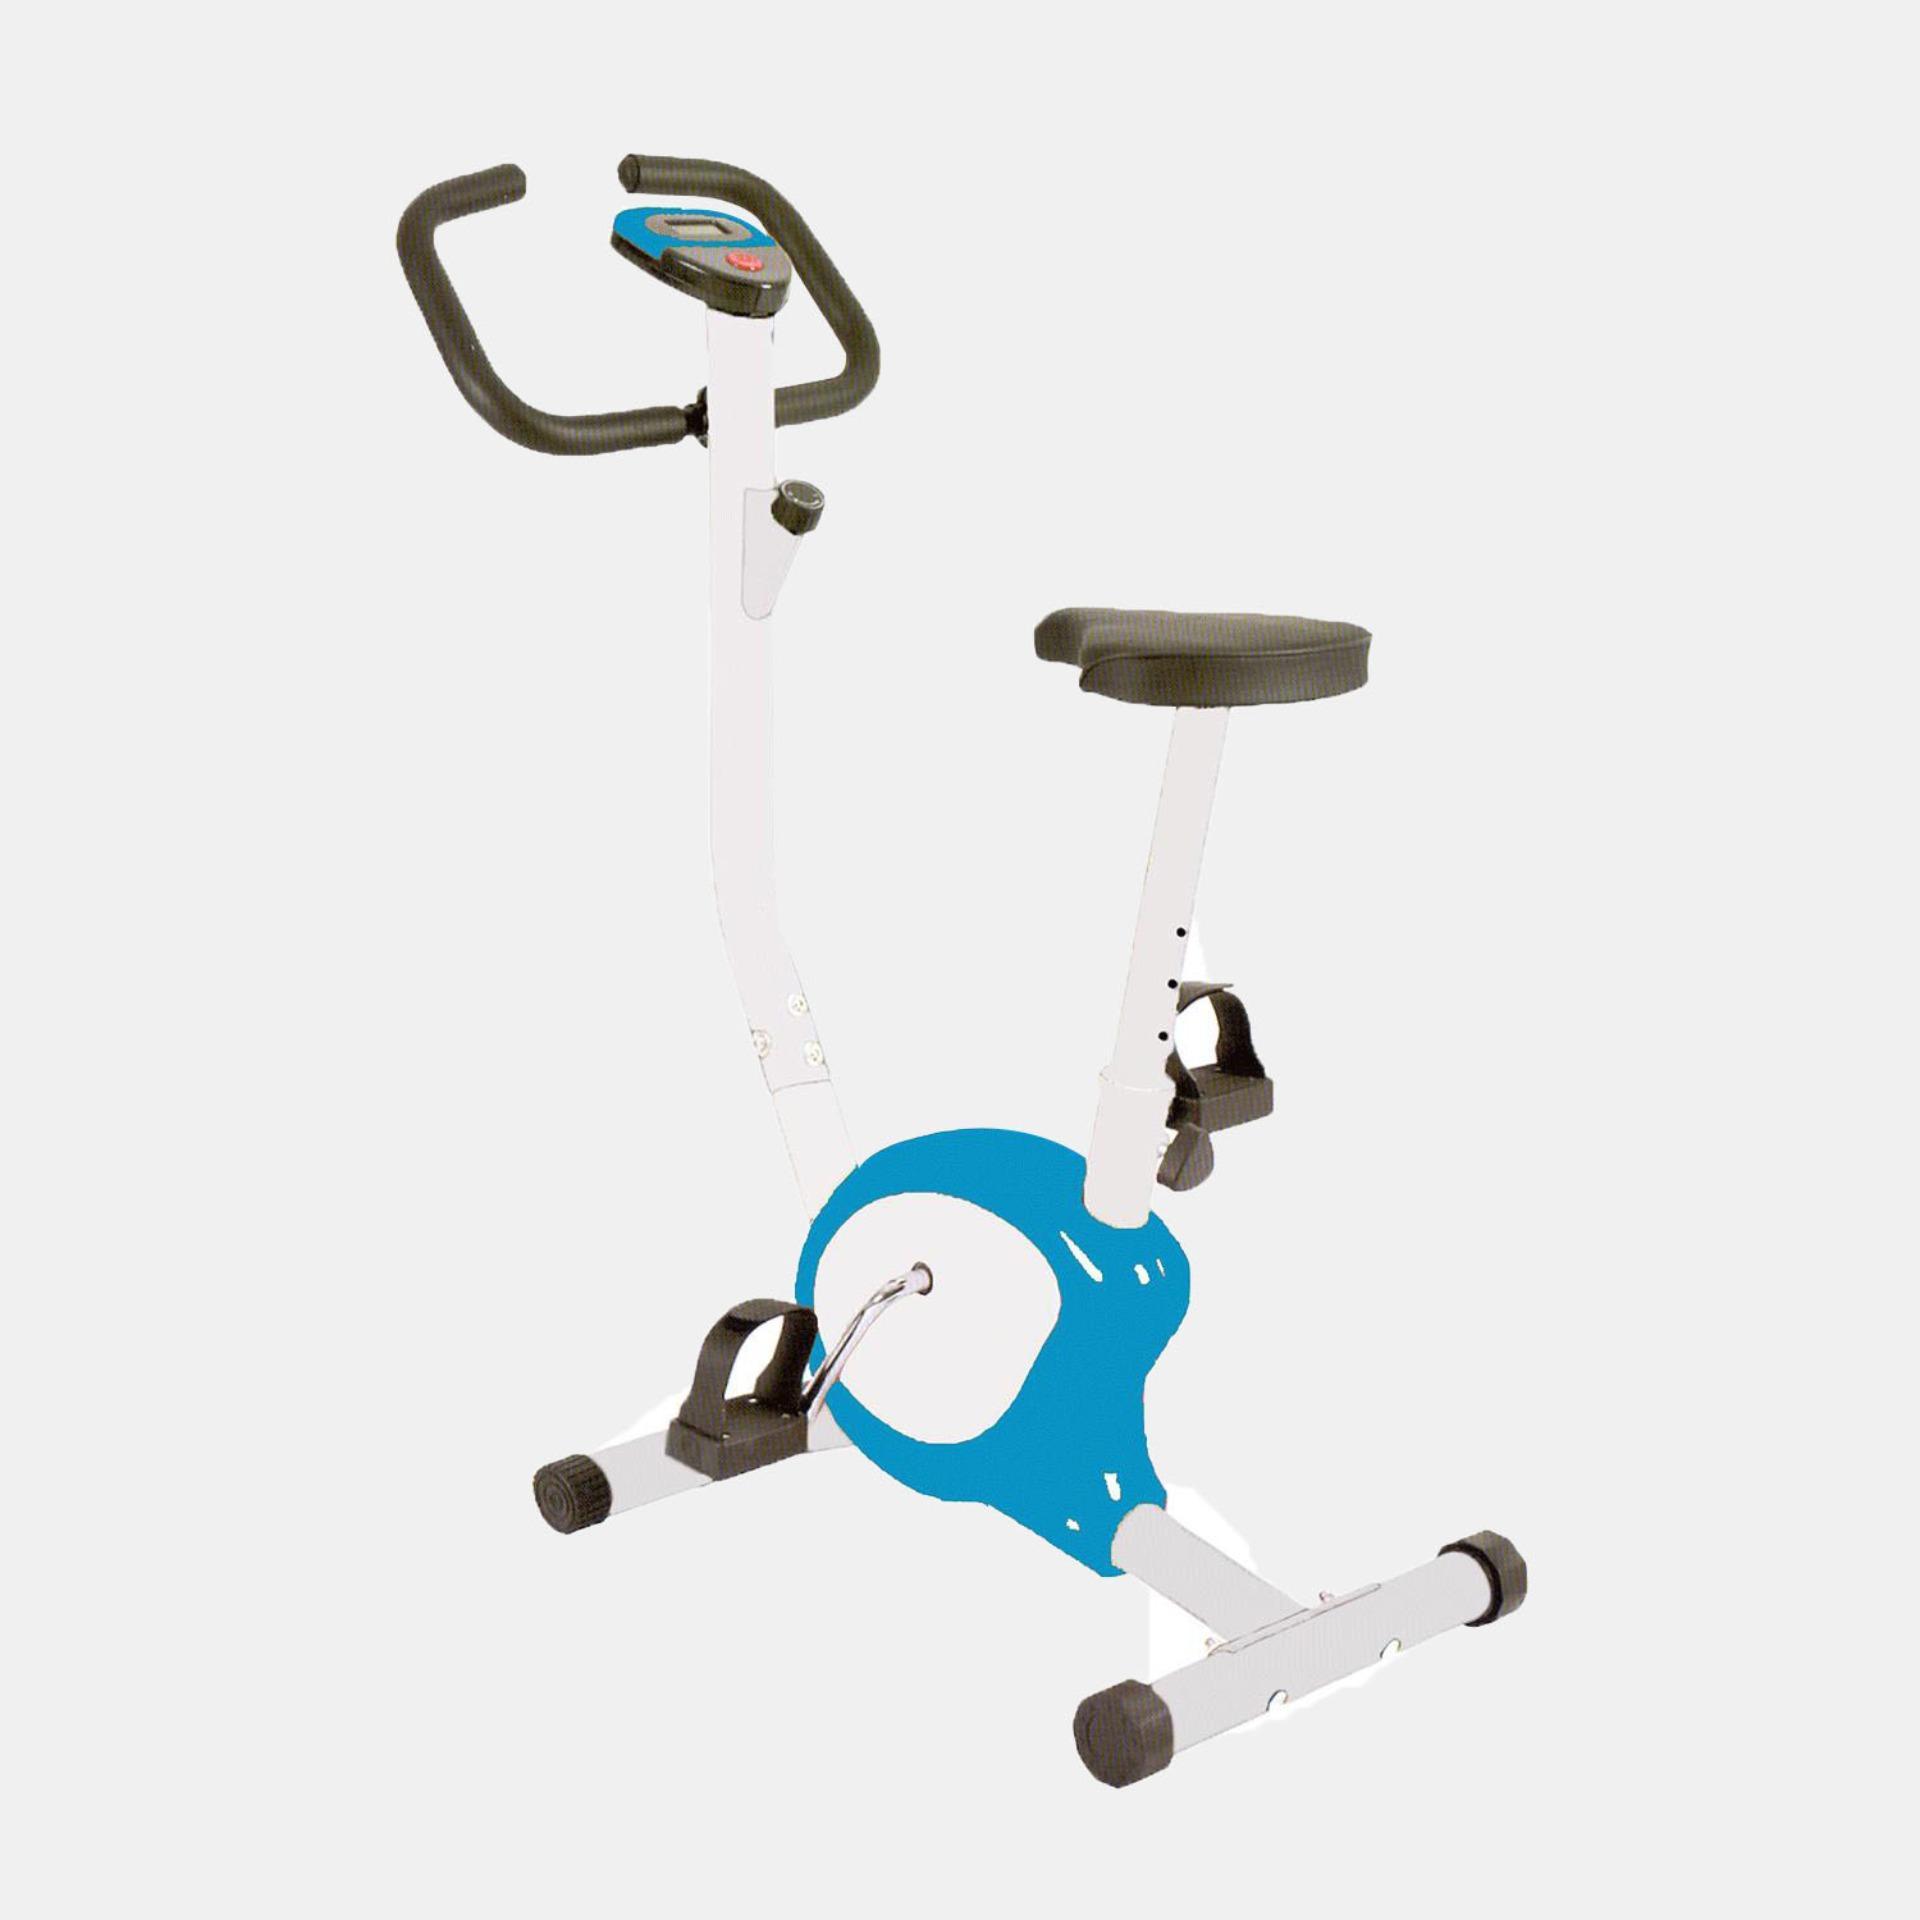 Jual Sepeda Kardio Fitness Terbaik Sepatu Olahraga Lari Lokal  Fans Veloz N Total Statis Tl 8215 Mini Bike Exercise